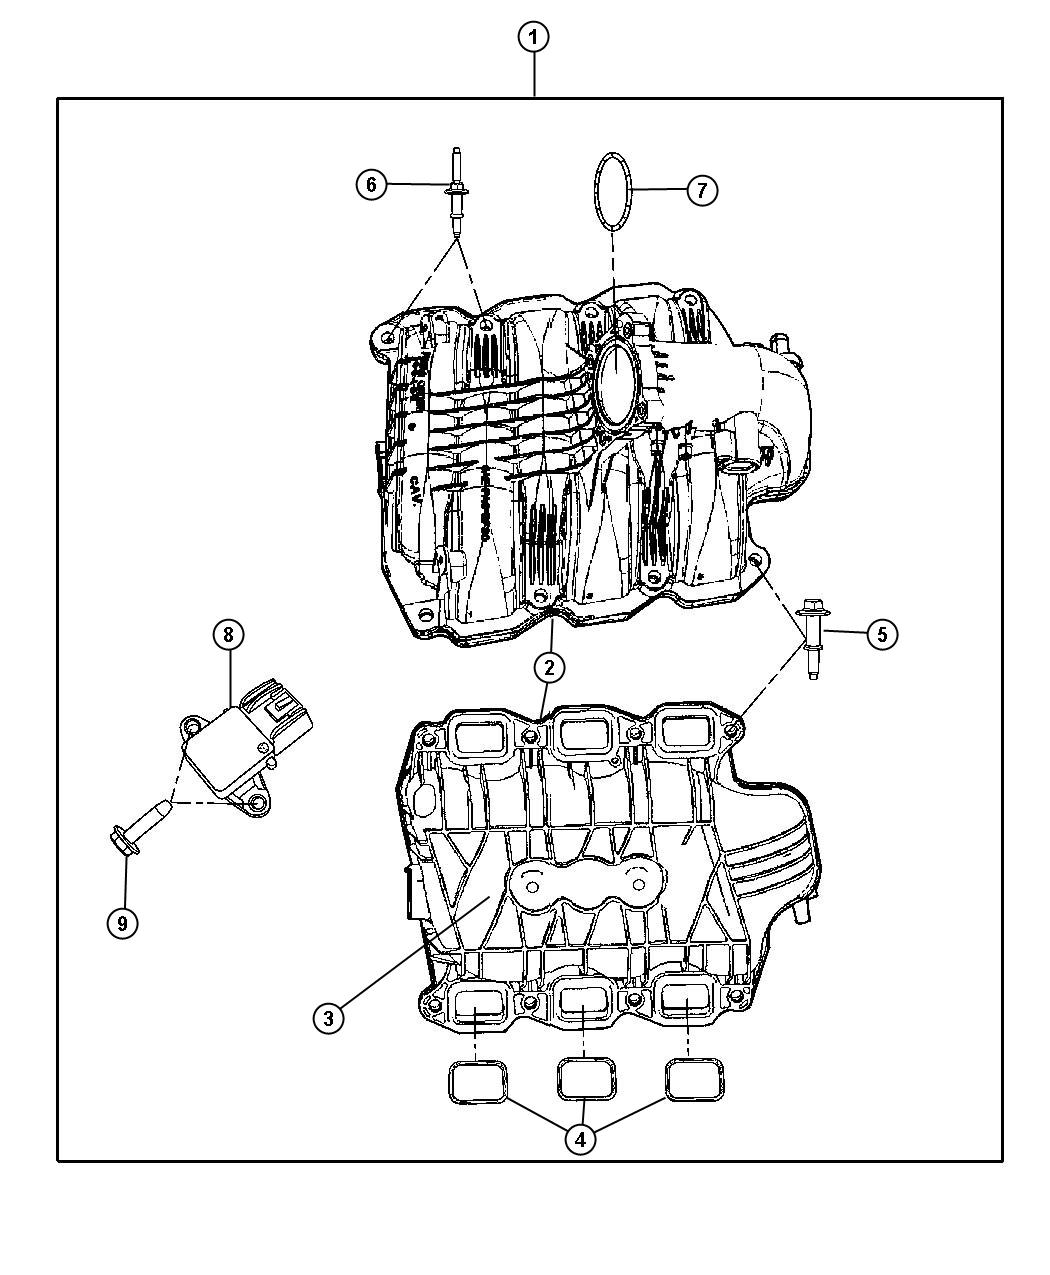 Jeep Commander Pad. Engine. Ekg, intake, manifolds